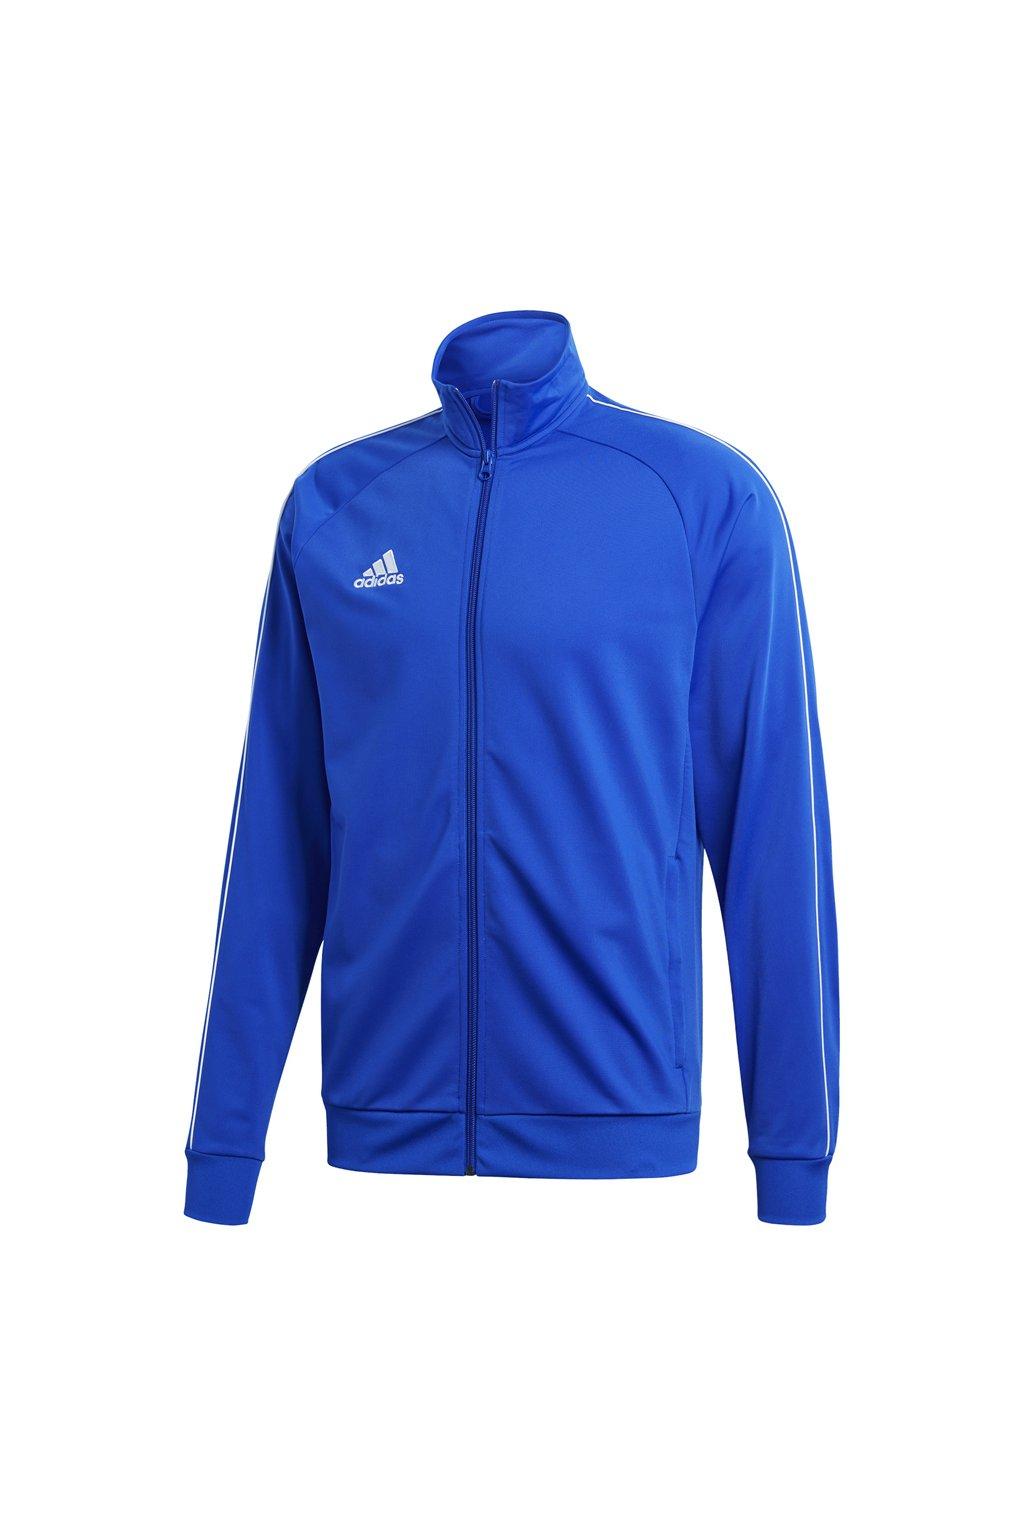 Pánska mikina Adidas Core 18 Polyester modrá CV3564